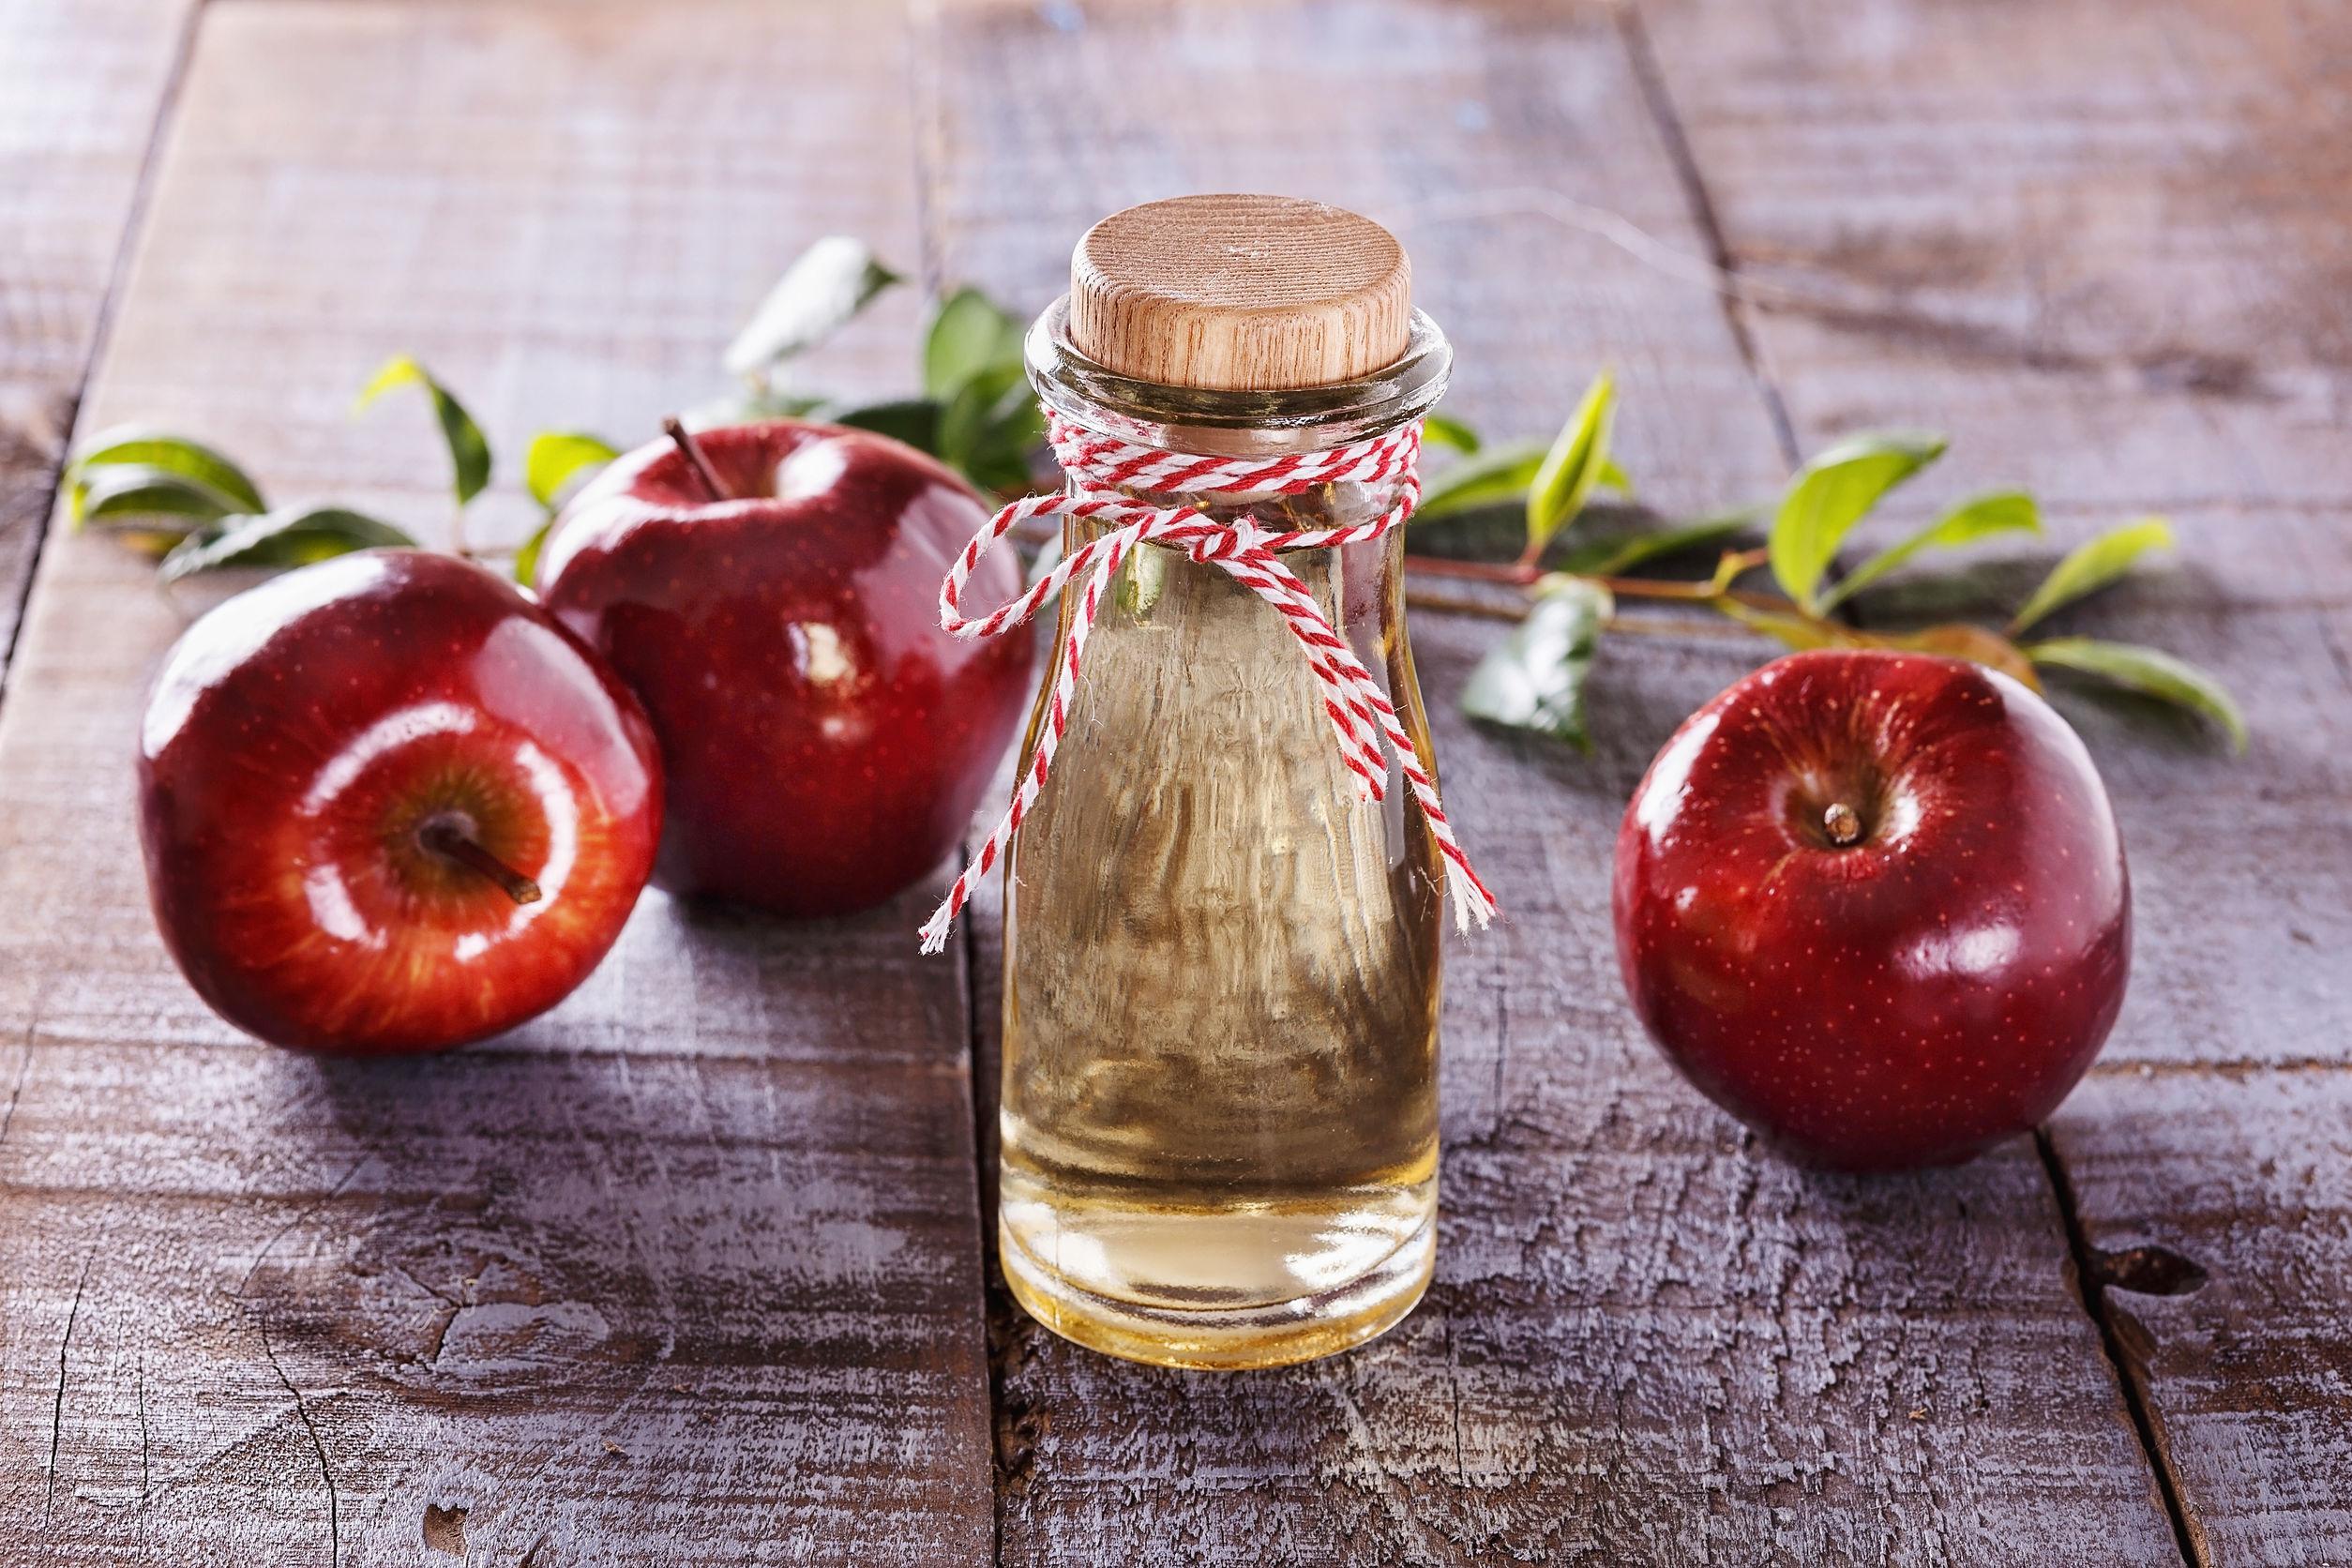 43642807 - apple cider vinegar and red apples over rustic wooden background